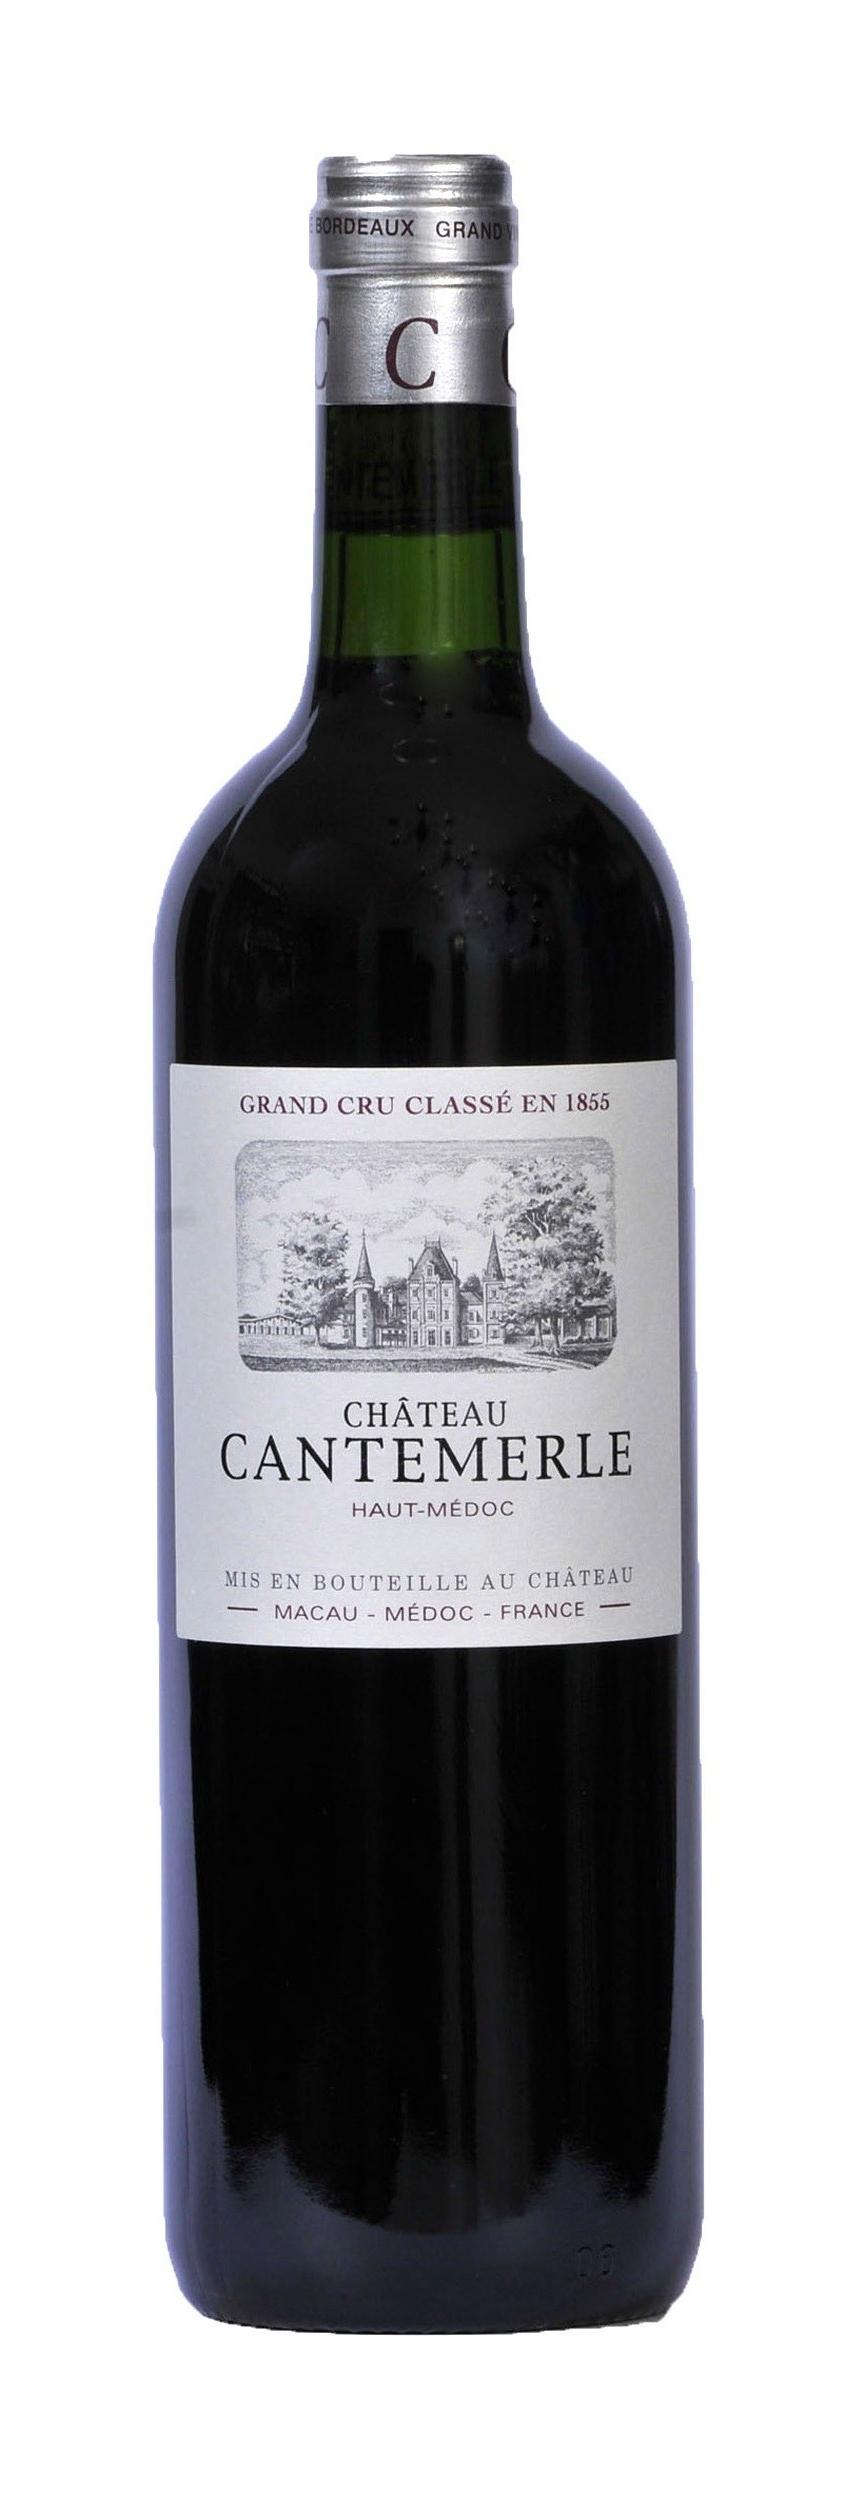 ChâteauCantemerle2012.jpg